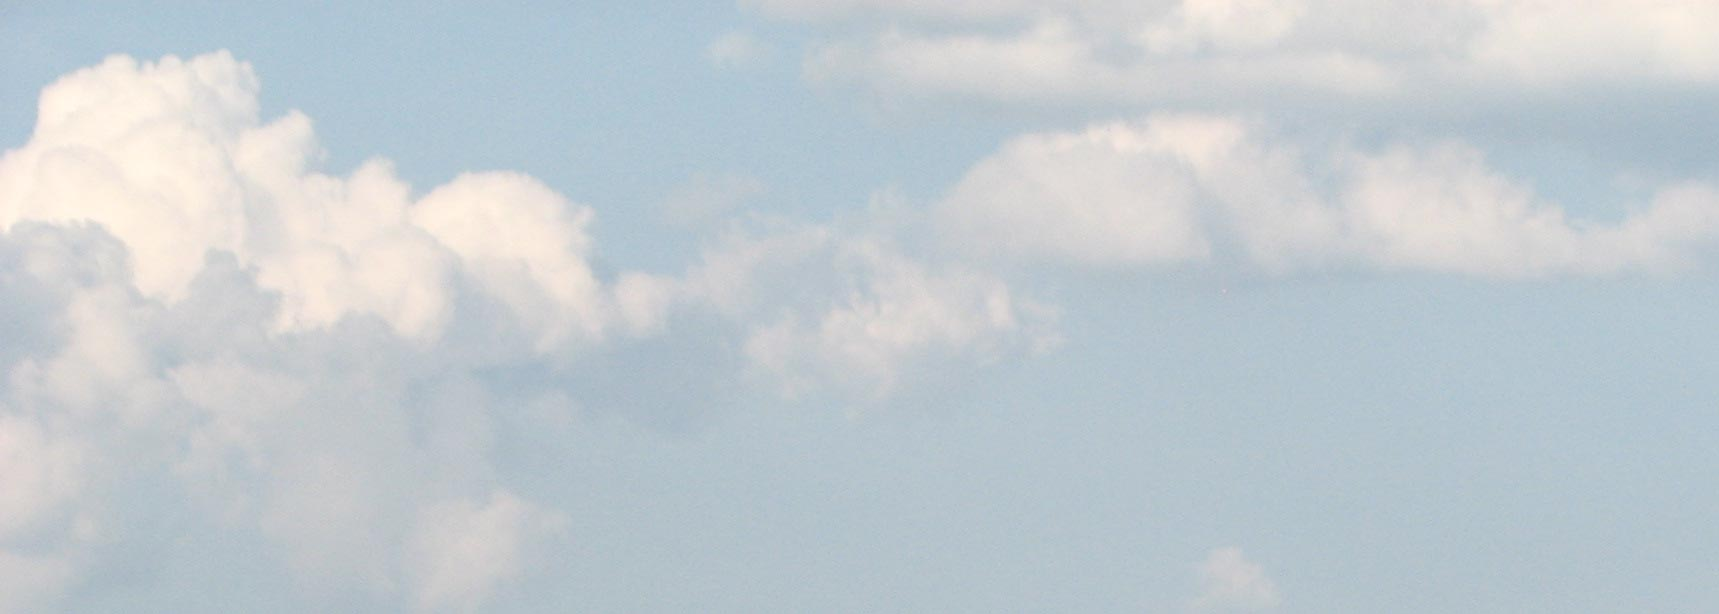 cloudsBG